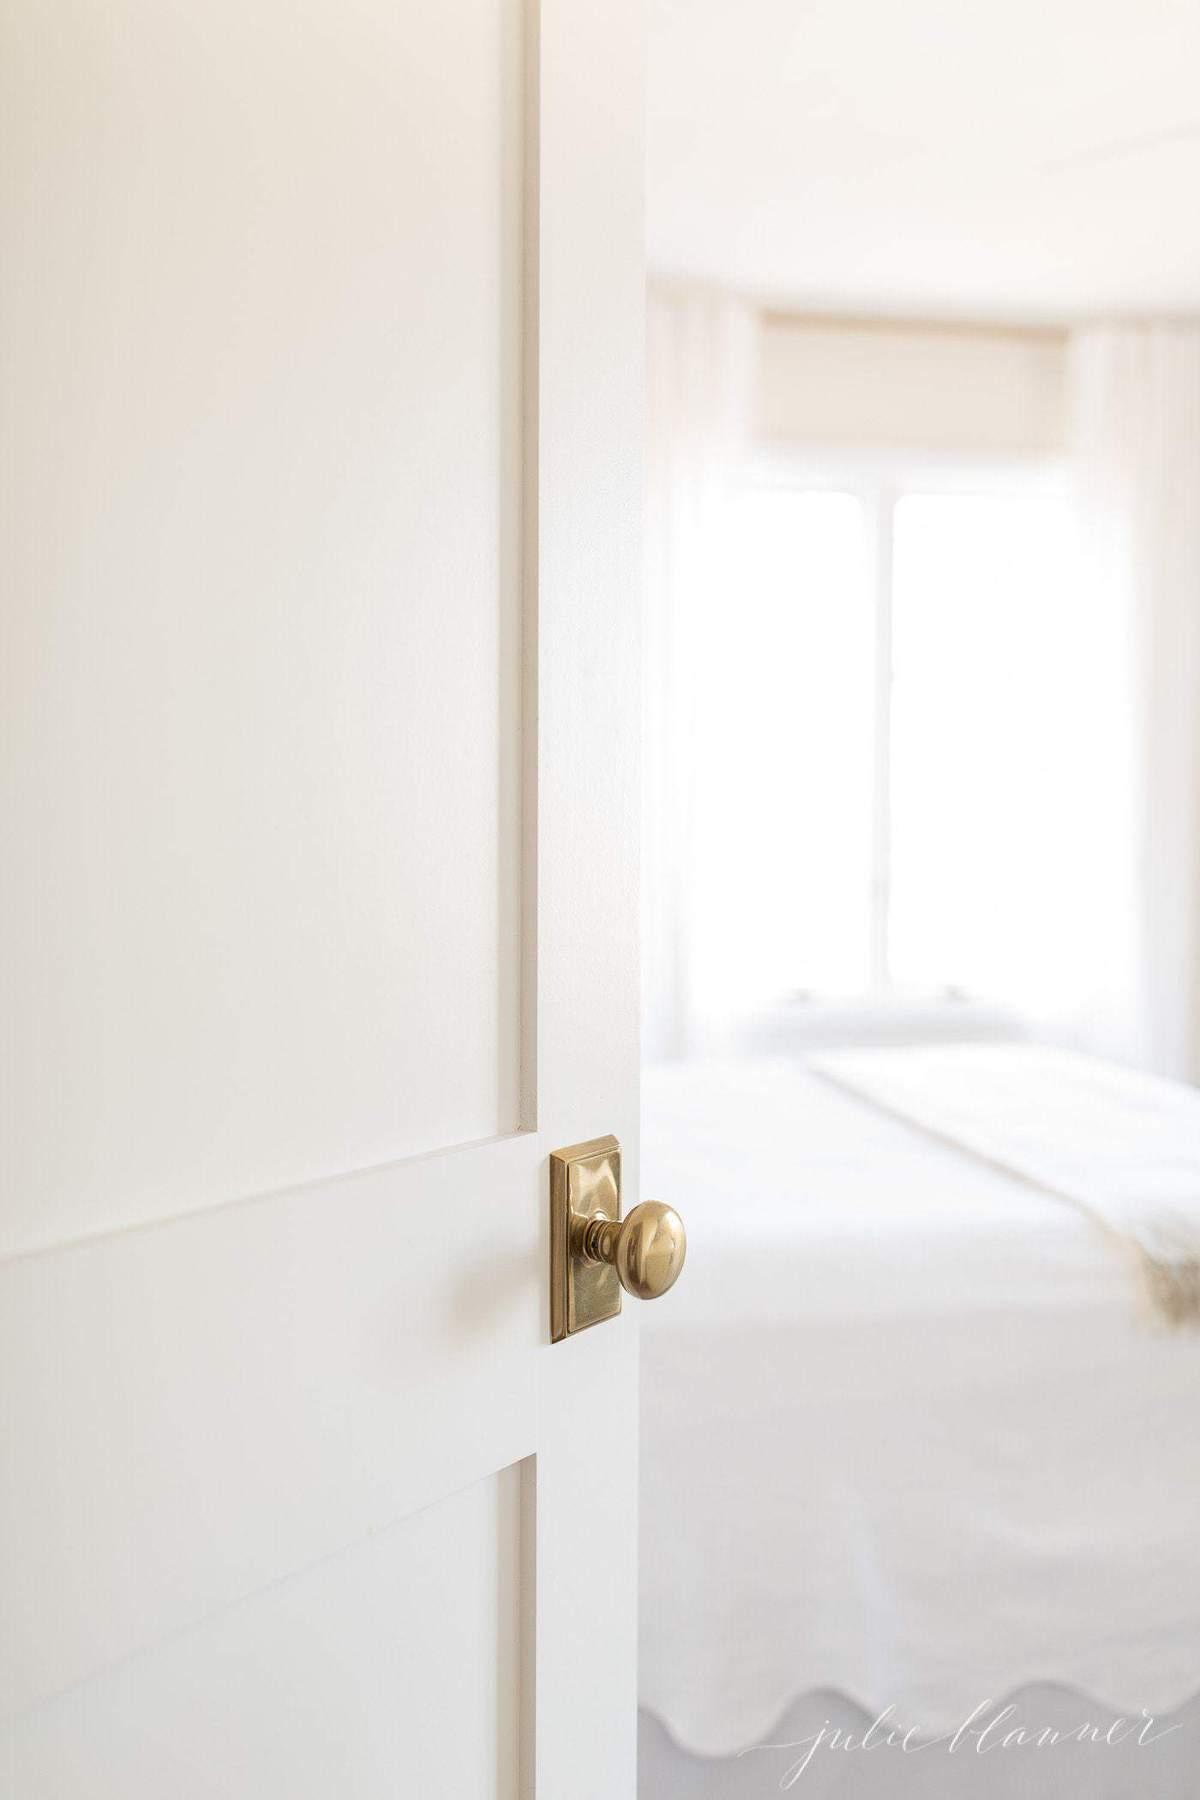 A new door with a brass doorknob peeking into a guest bedroom.